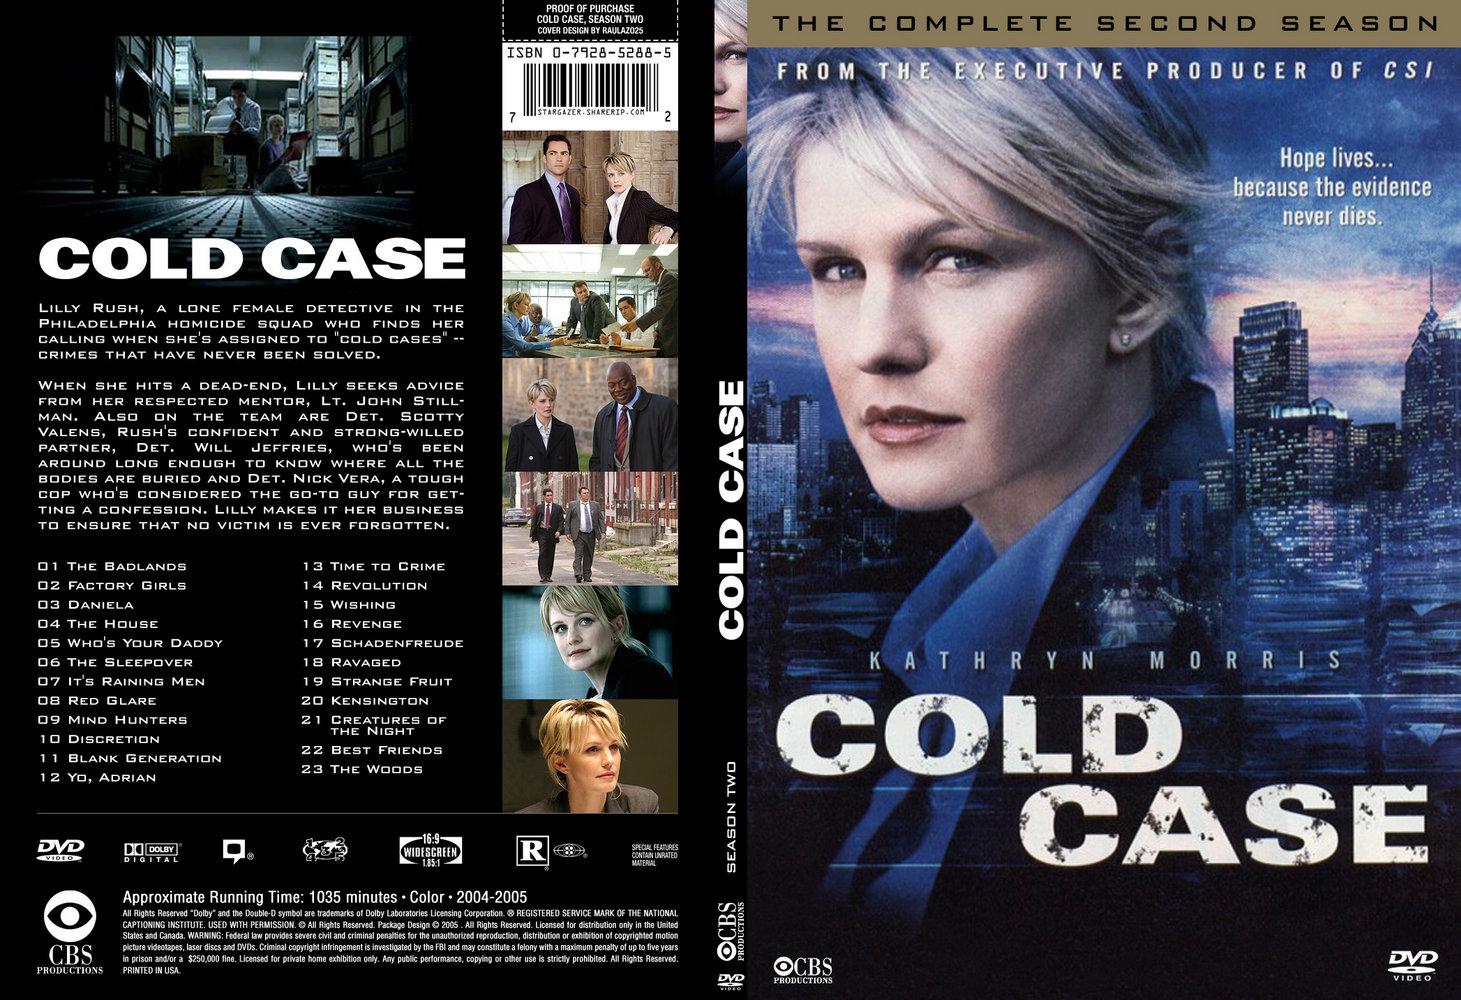 Cold Case Imdb